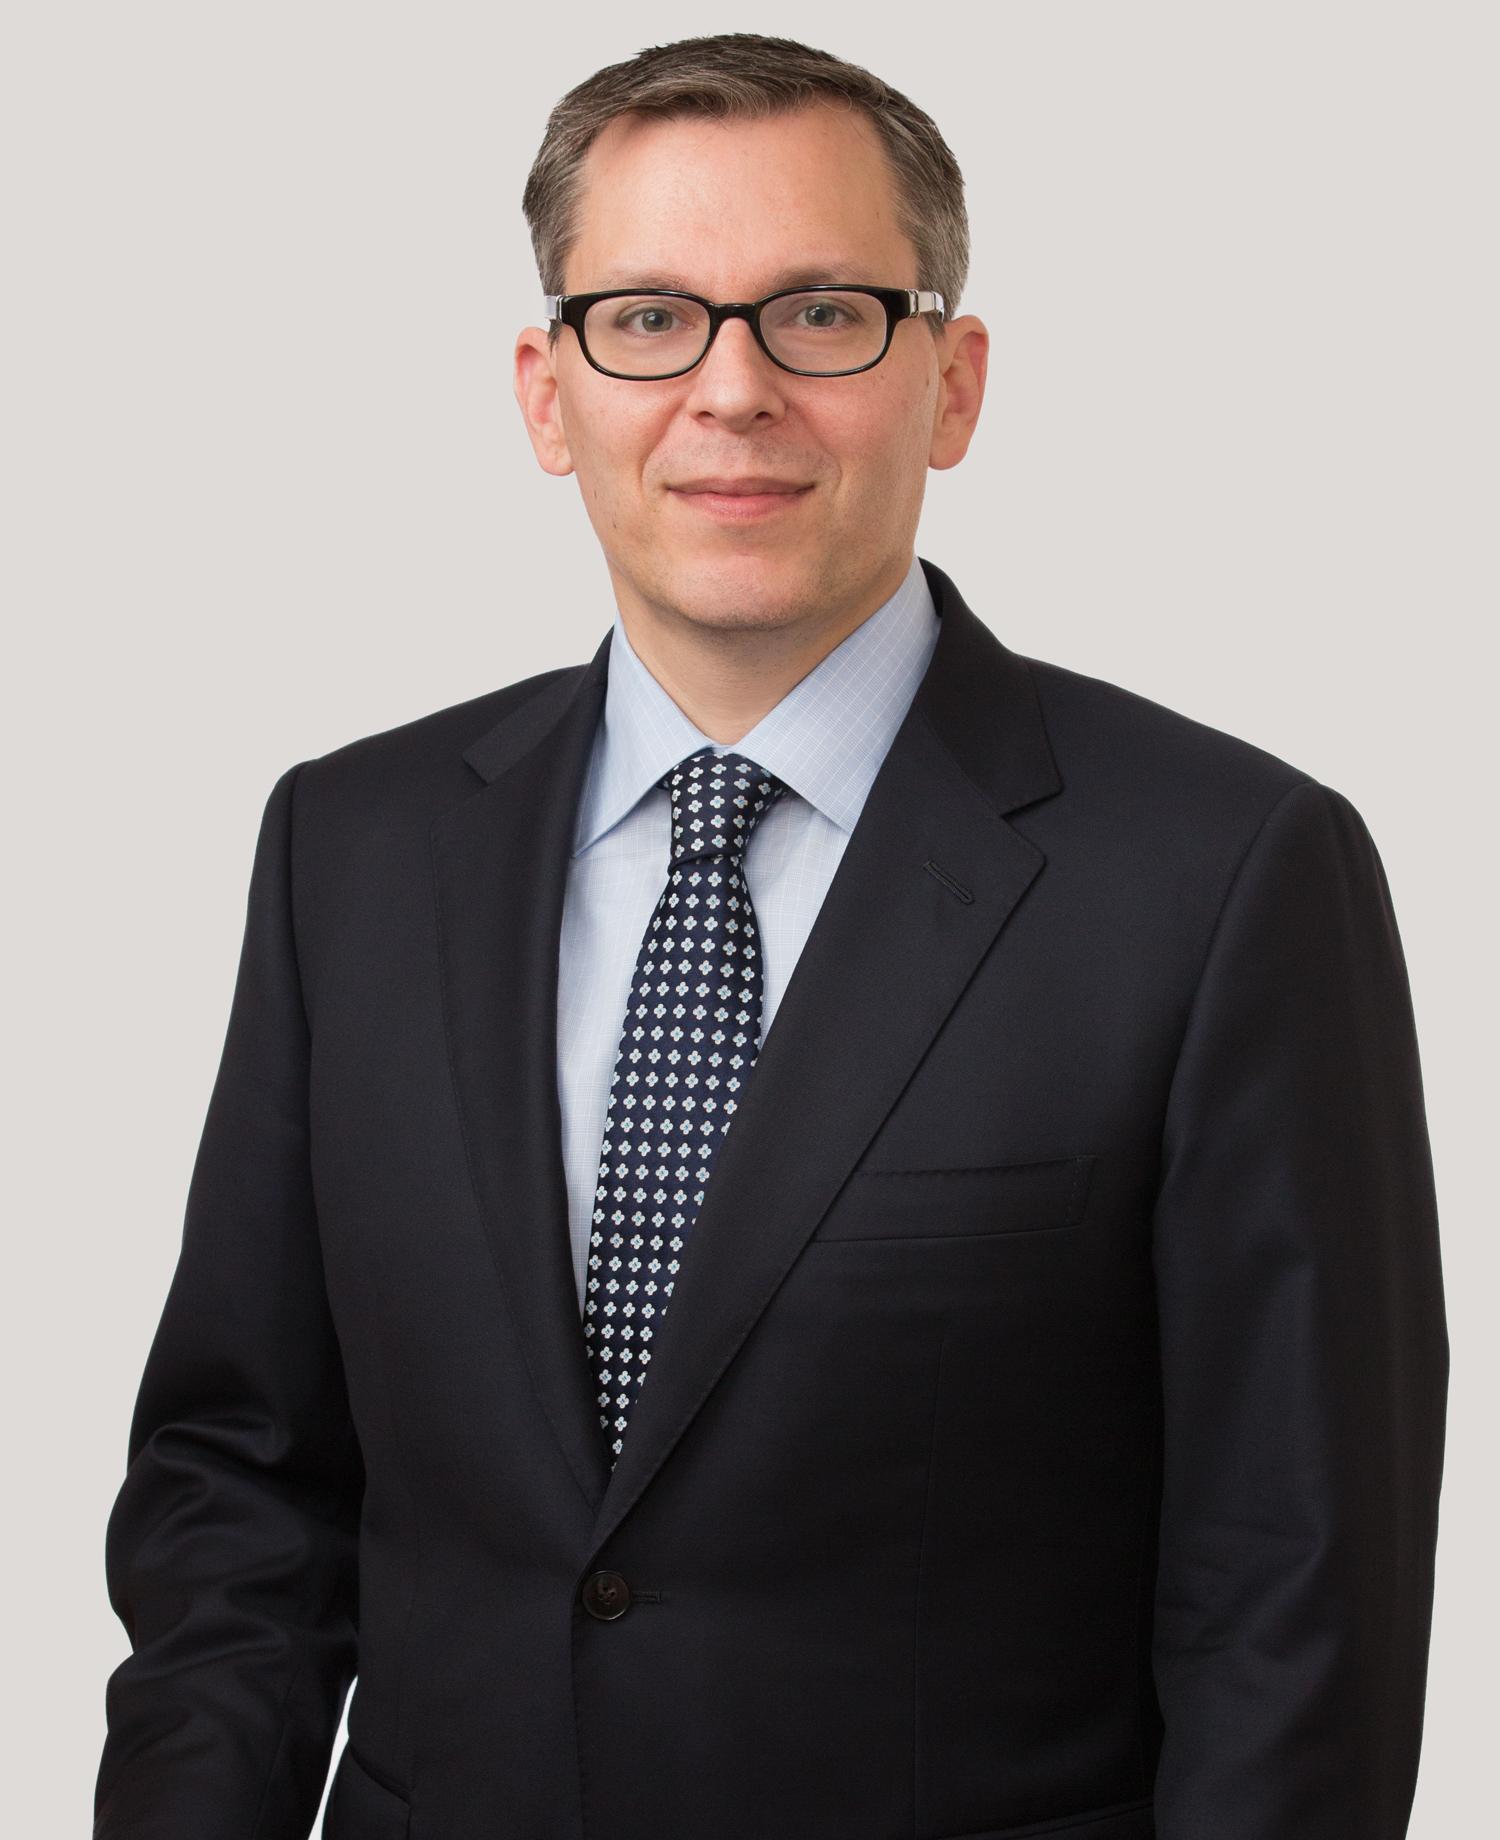 Matthew P. Previn